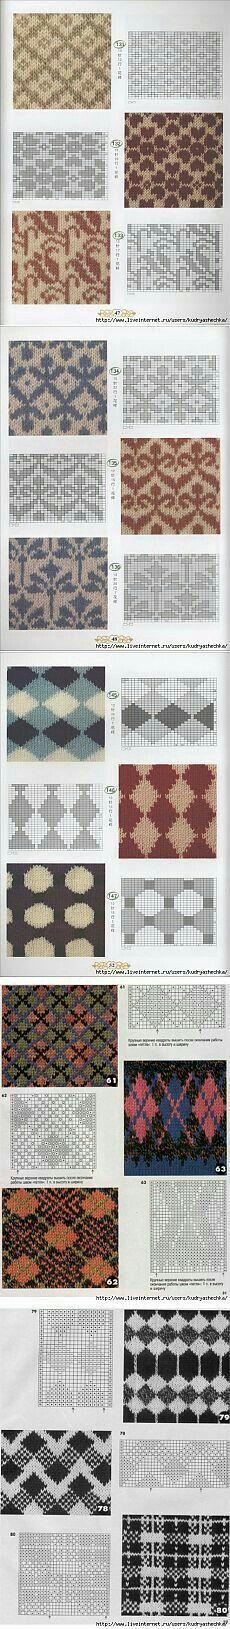 posibilidades colorwork para e | | Tapestry crochet | Pinterest ...